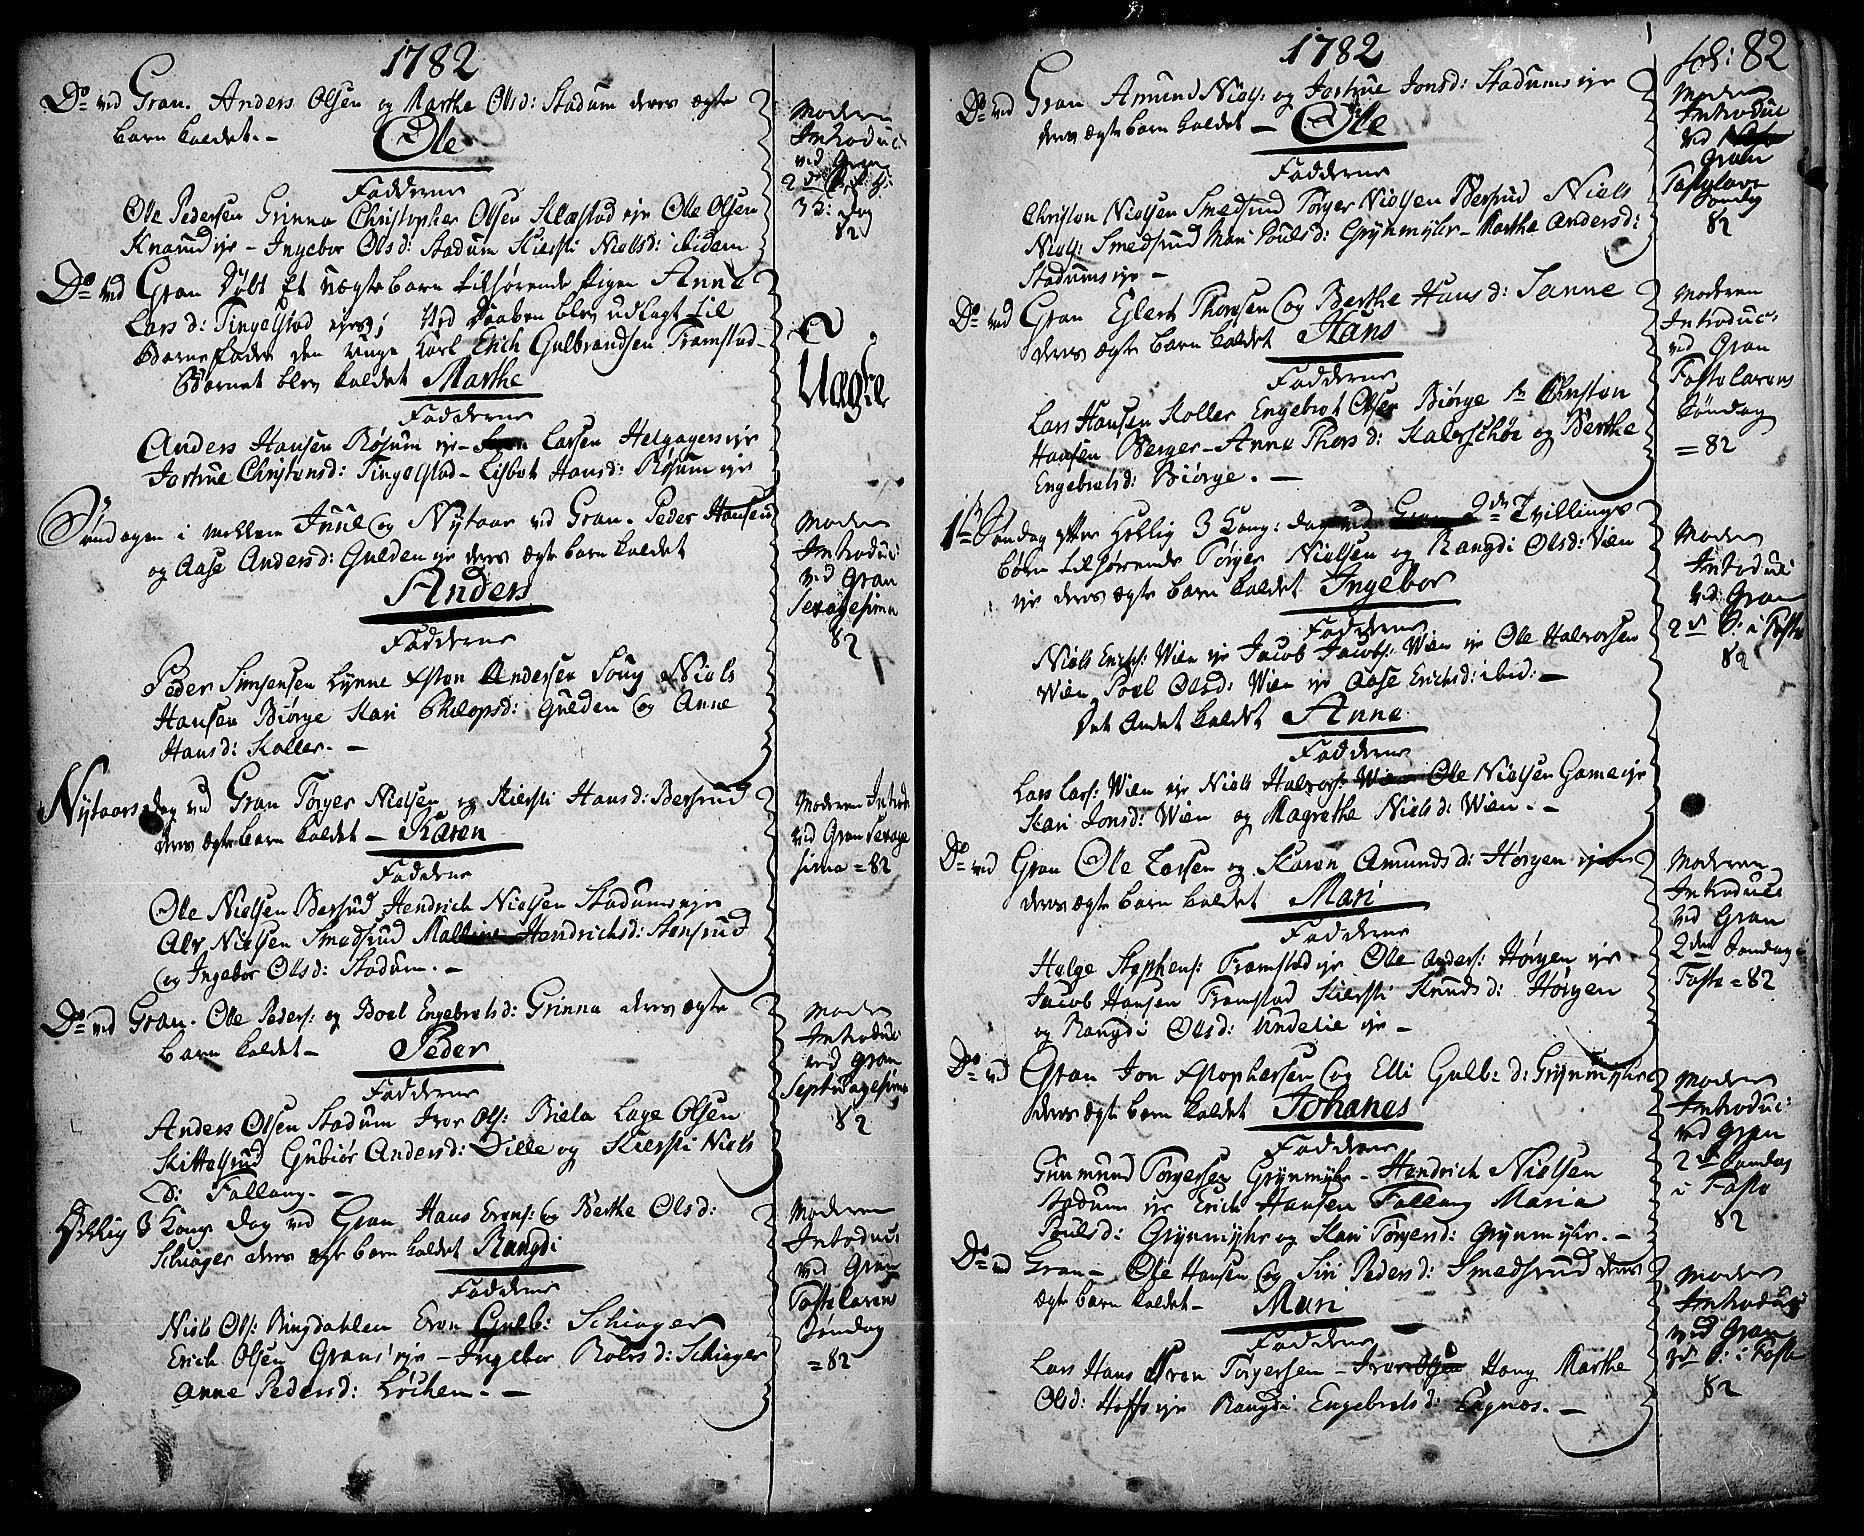 SAH, Gran prestekontor, Ministerialbok nr. 5, 1776-1788, s. 82